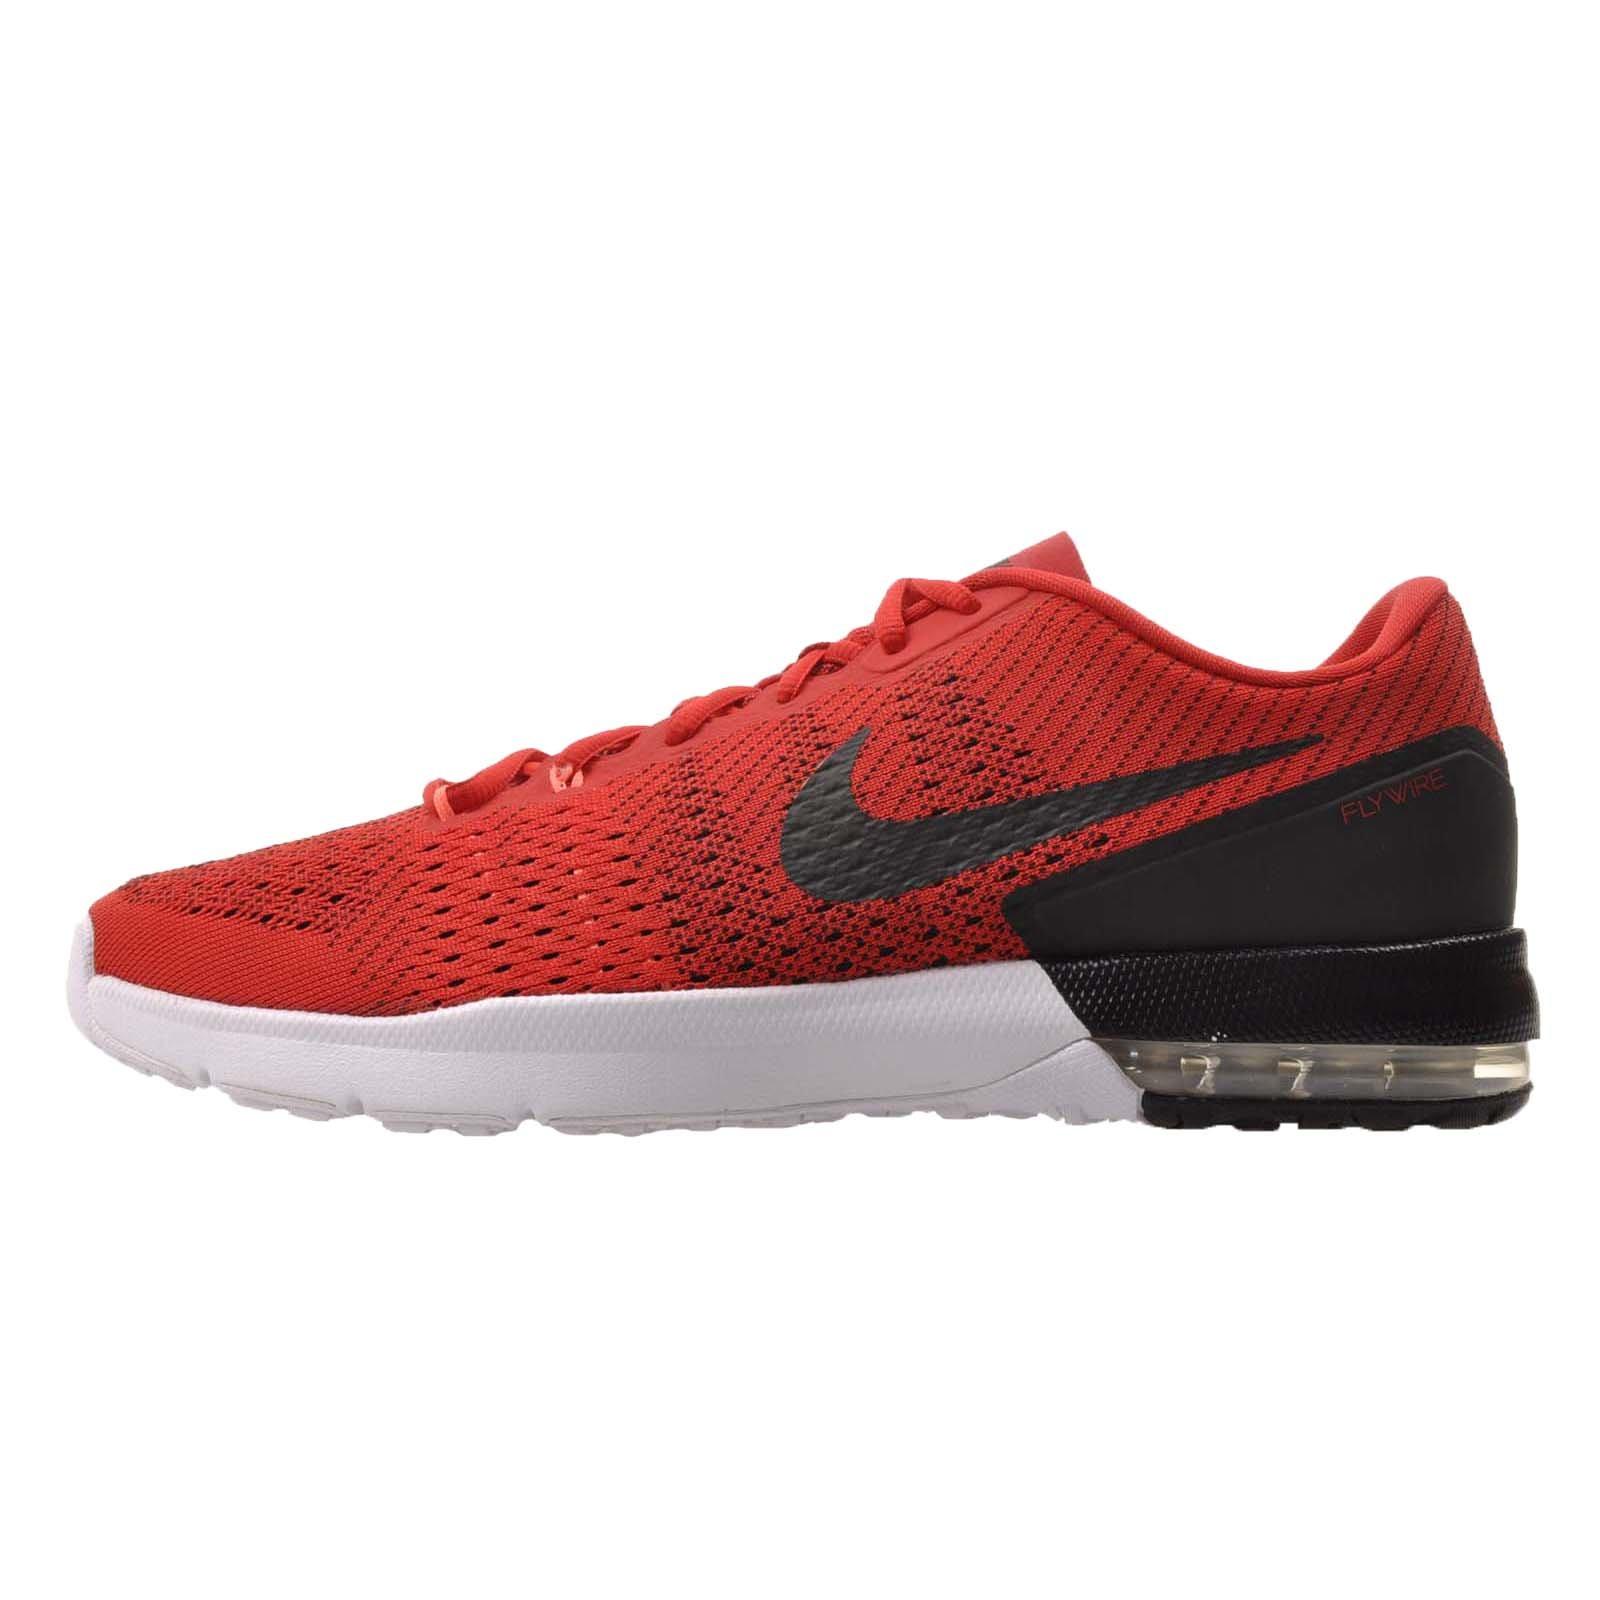 Nike Men's Air Max Typha Training Shoe University Red/Black/Bright Mango/White Size 8 M US